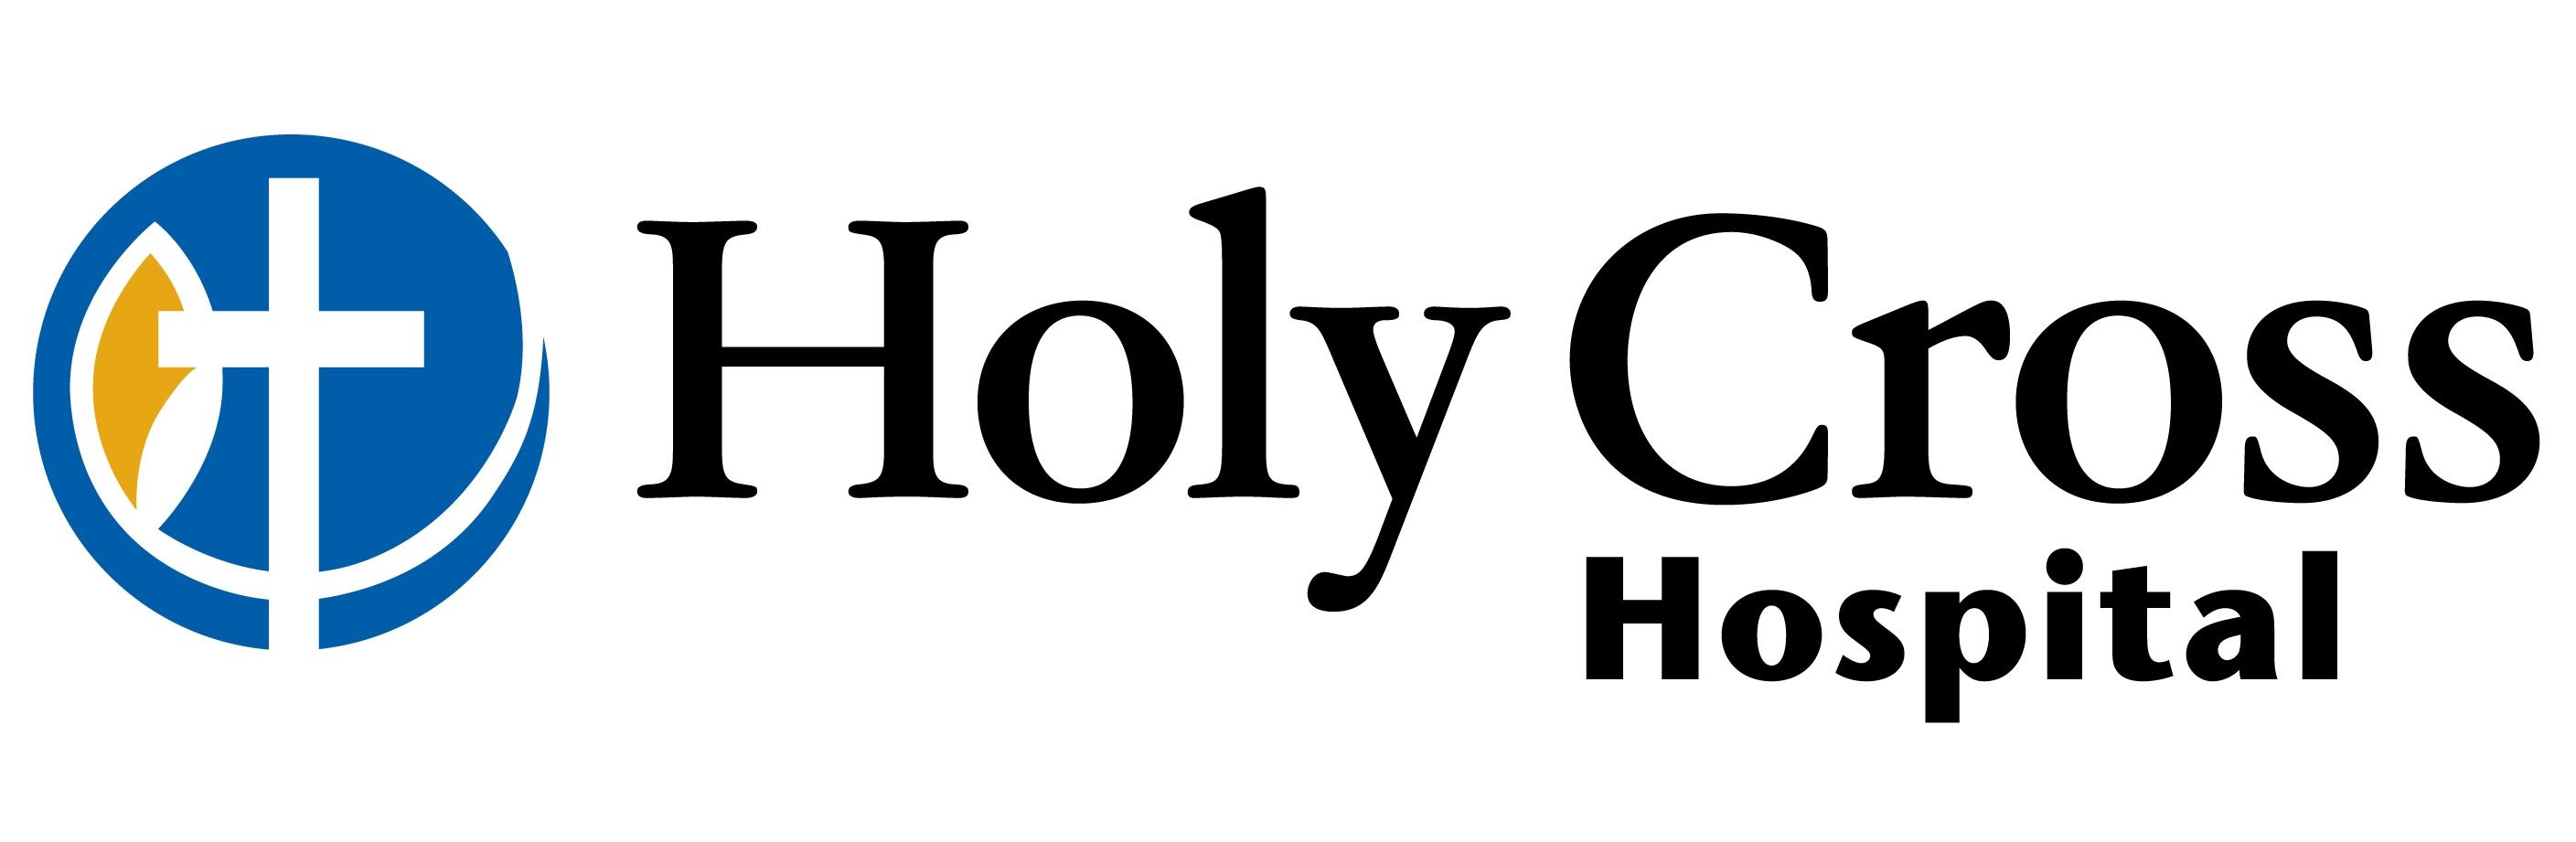 Trinity Air Ambulance International is a partner of Holy Cross Hospital